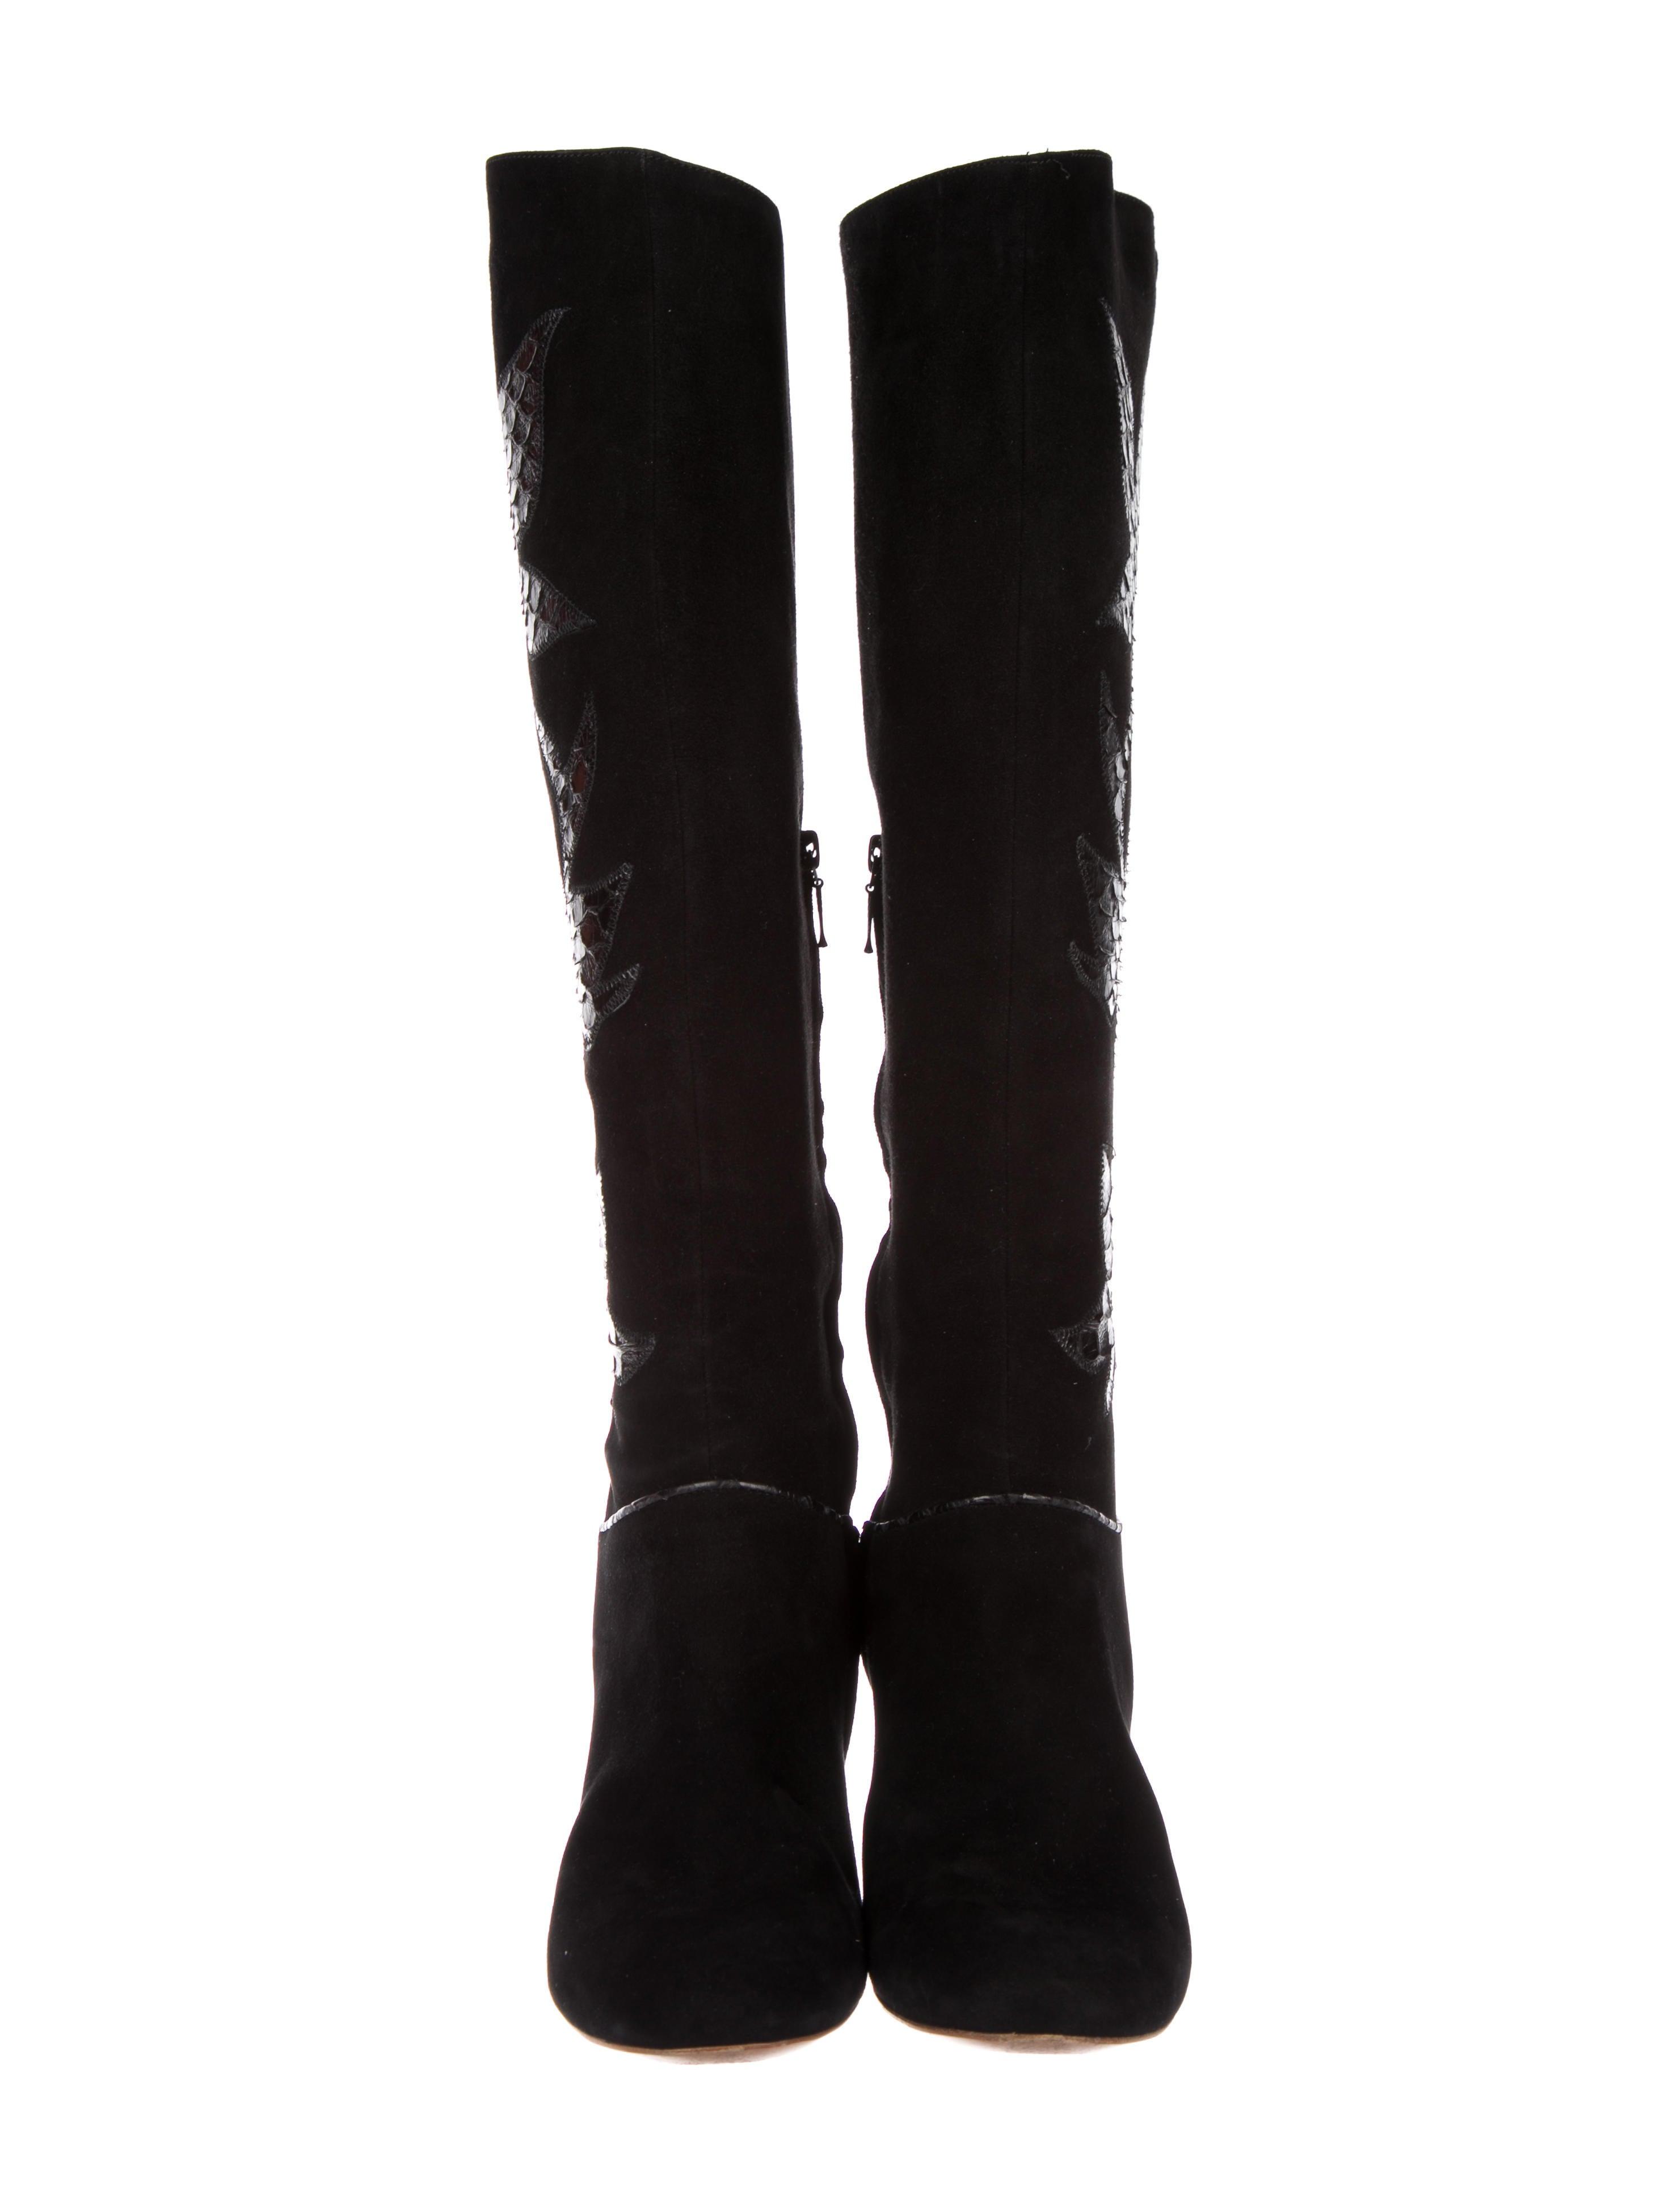 best seller sale online Catherine Malandrino Python-Applique Knee-High Boots discount brand new unisex amazon sale online LLdLy4D